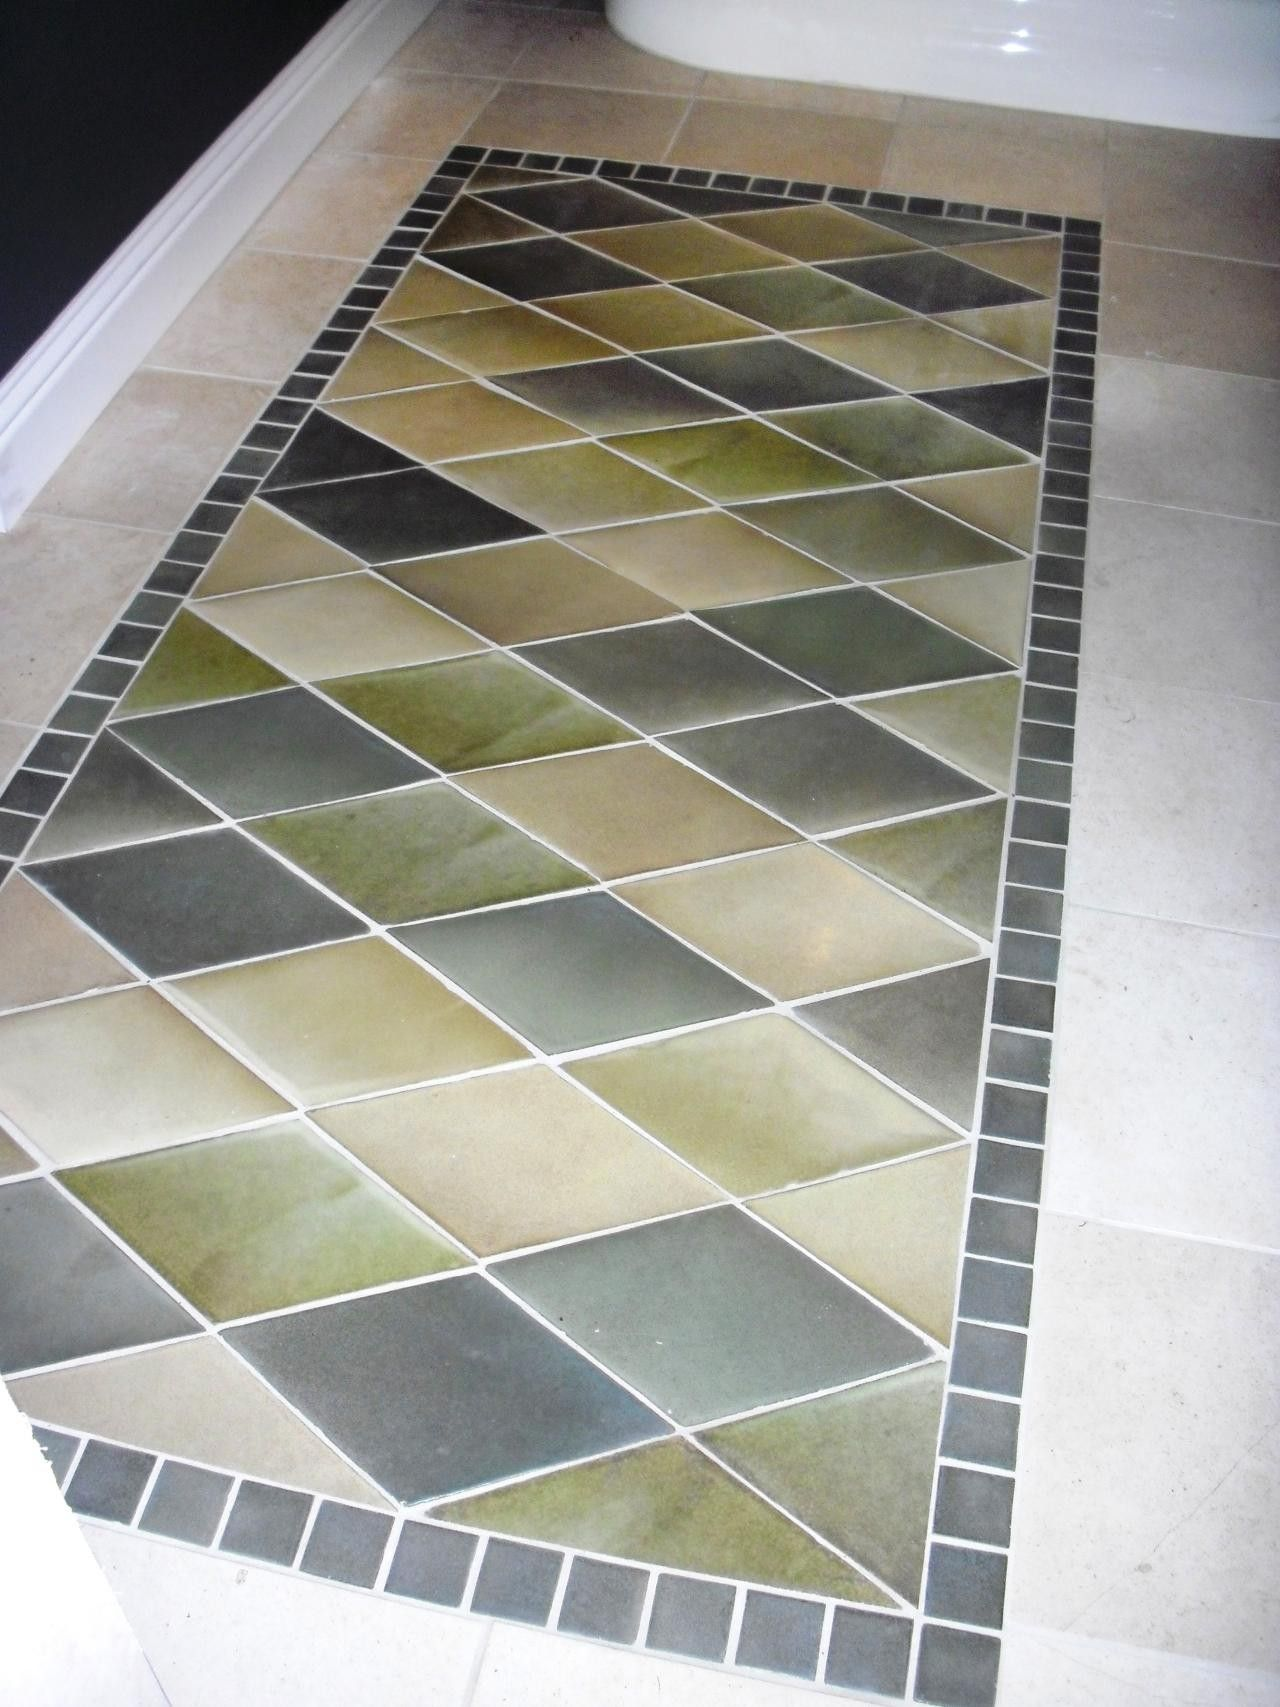 30 Creative Tile Rug Inlay Ideas For Your Bathroom The Urban Interior Creative Tile Bathroom Flooring Tile Rug